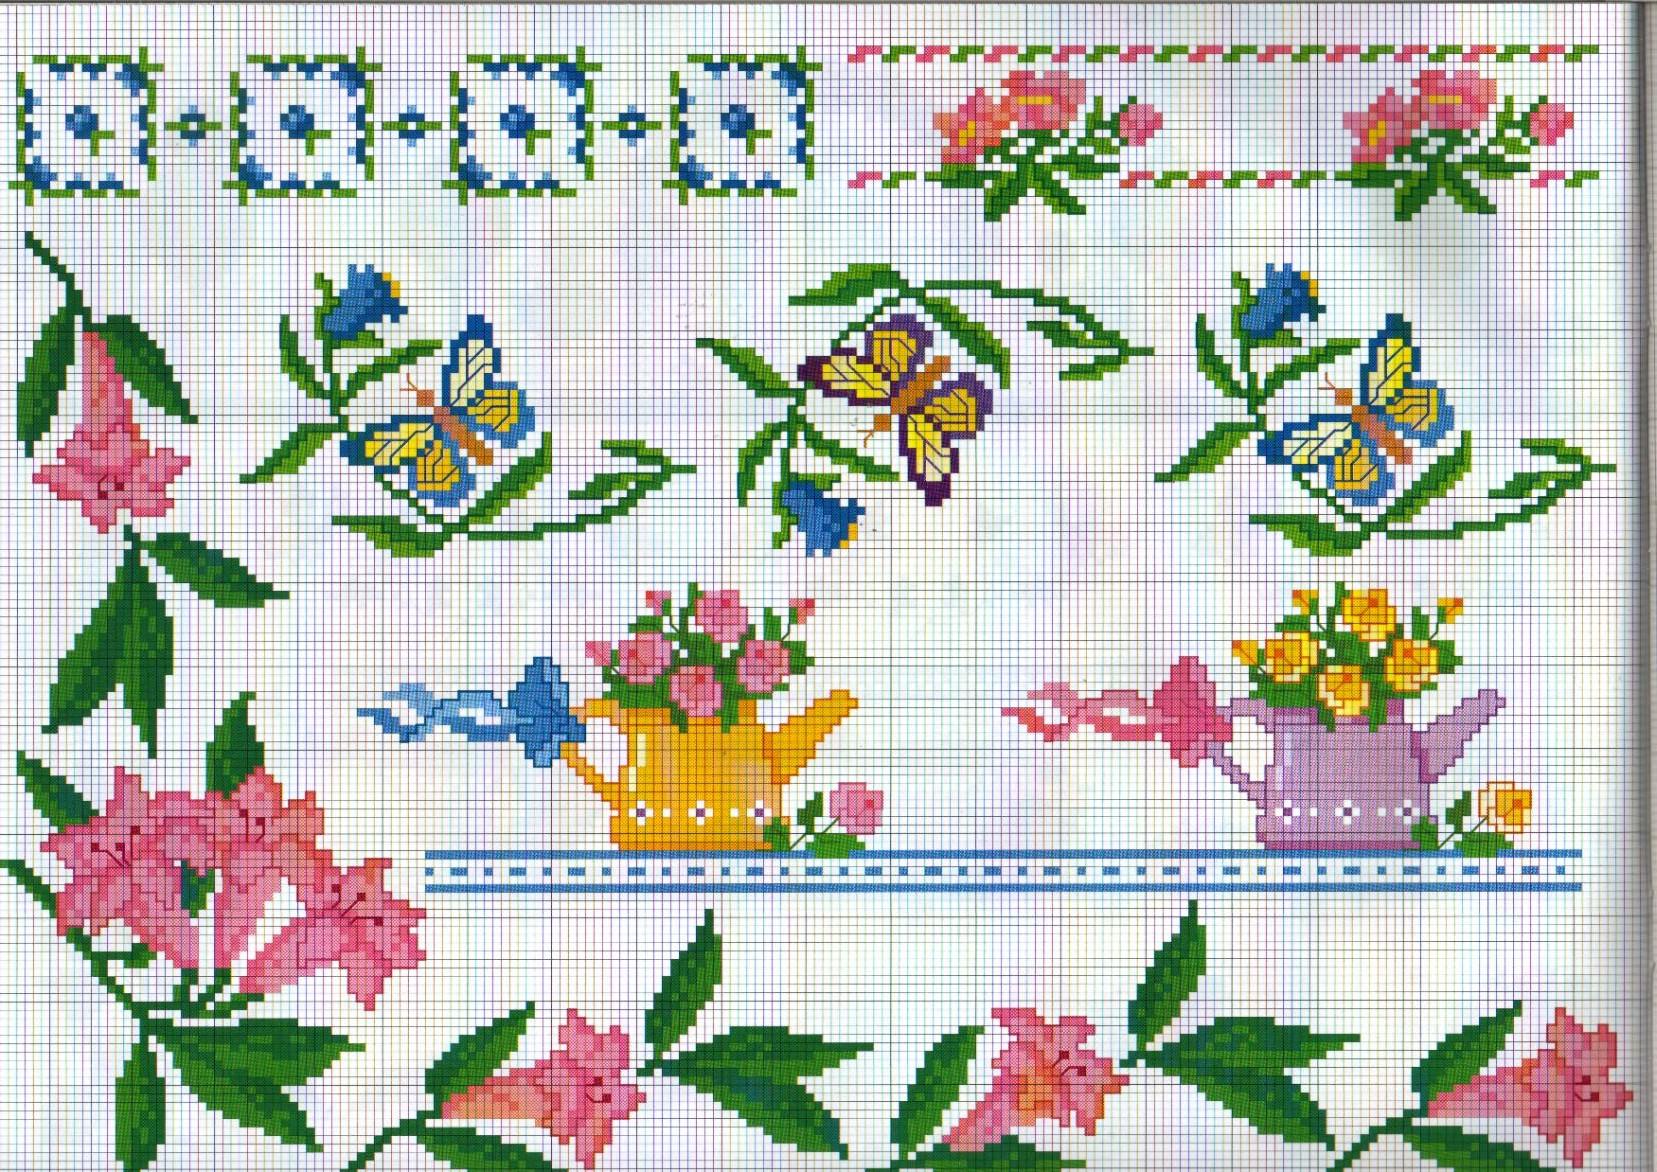 Bordure giardino annaffiatoi farfalle for Farfalle punto a croce